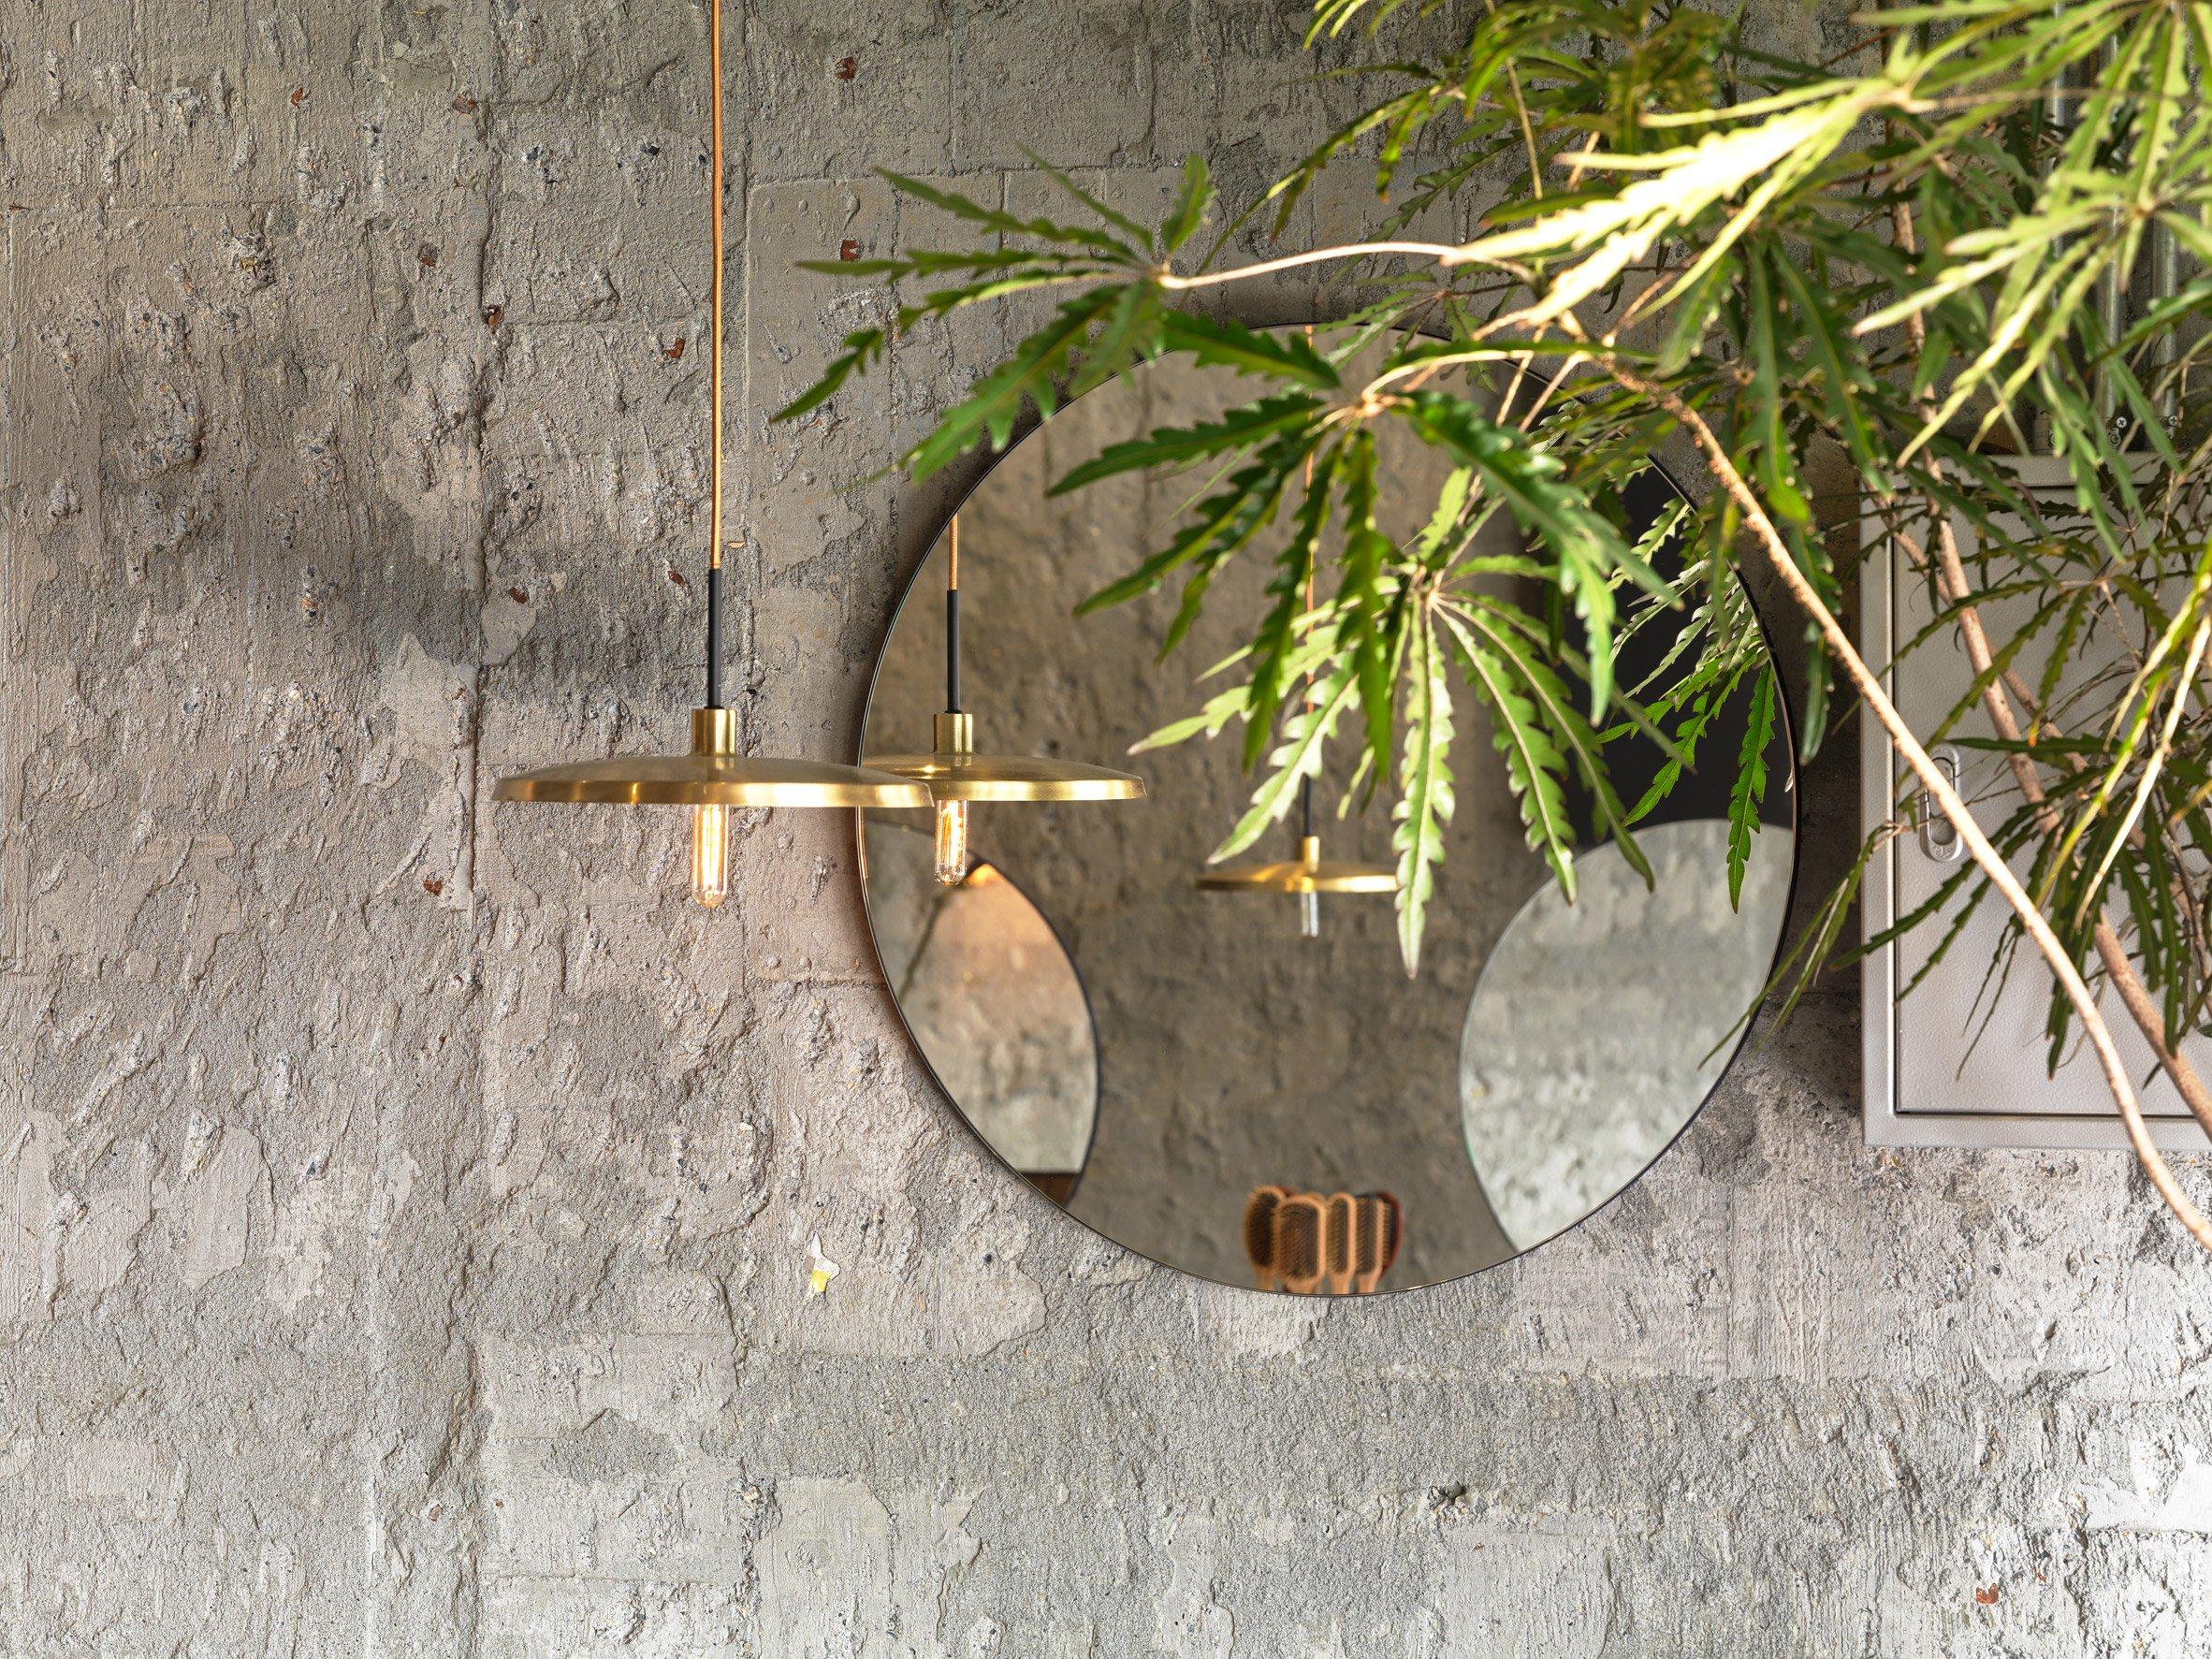 luna-salon-soar-design-interiors-changhua-taiwan_dezeen_2364_col_13